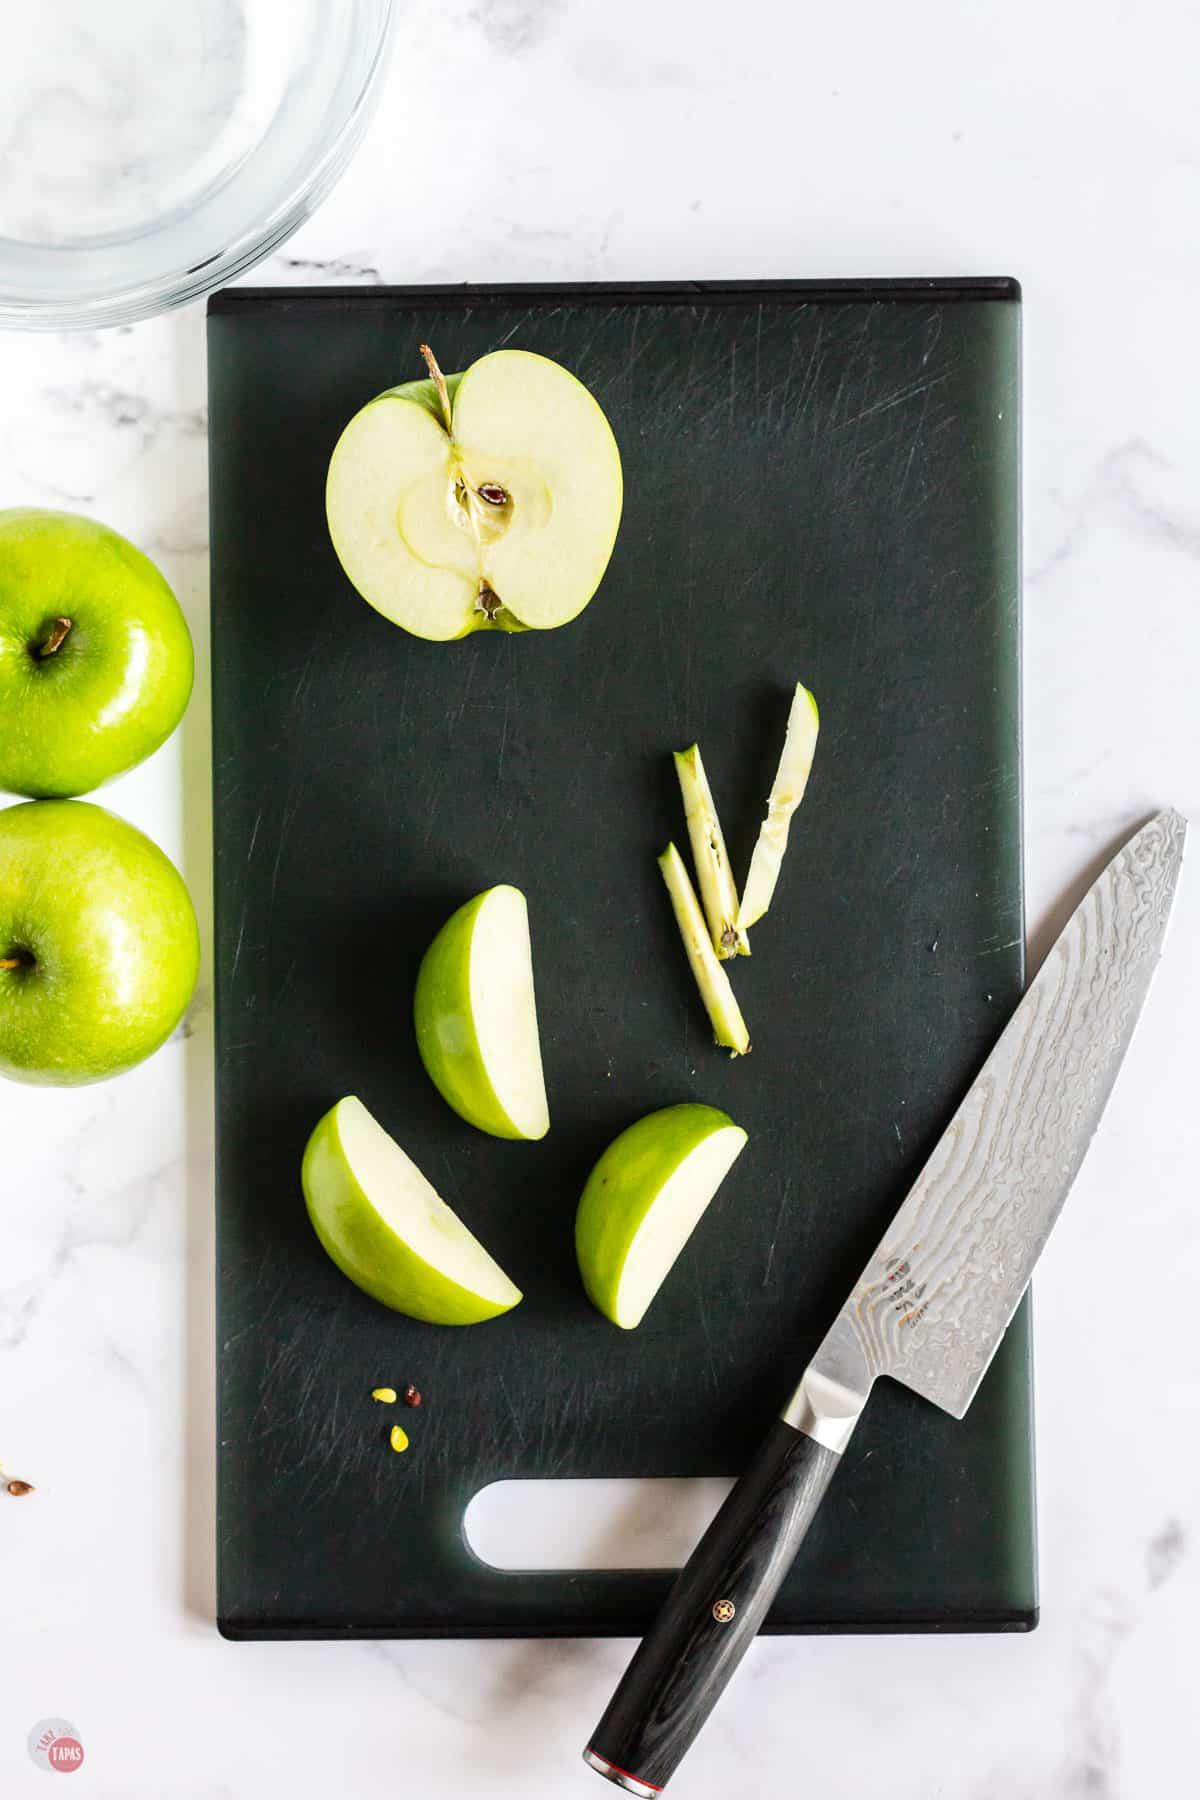 cur apples on a cutting board